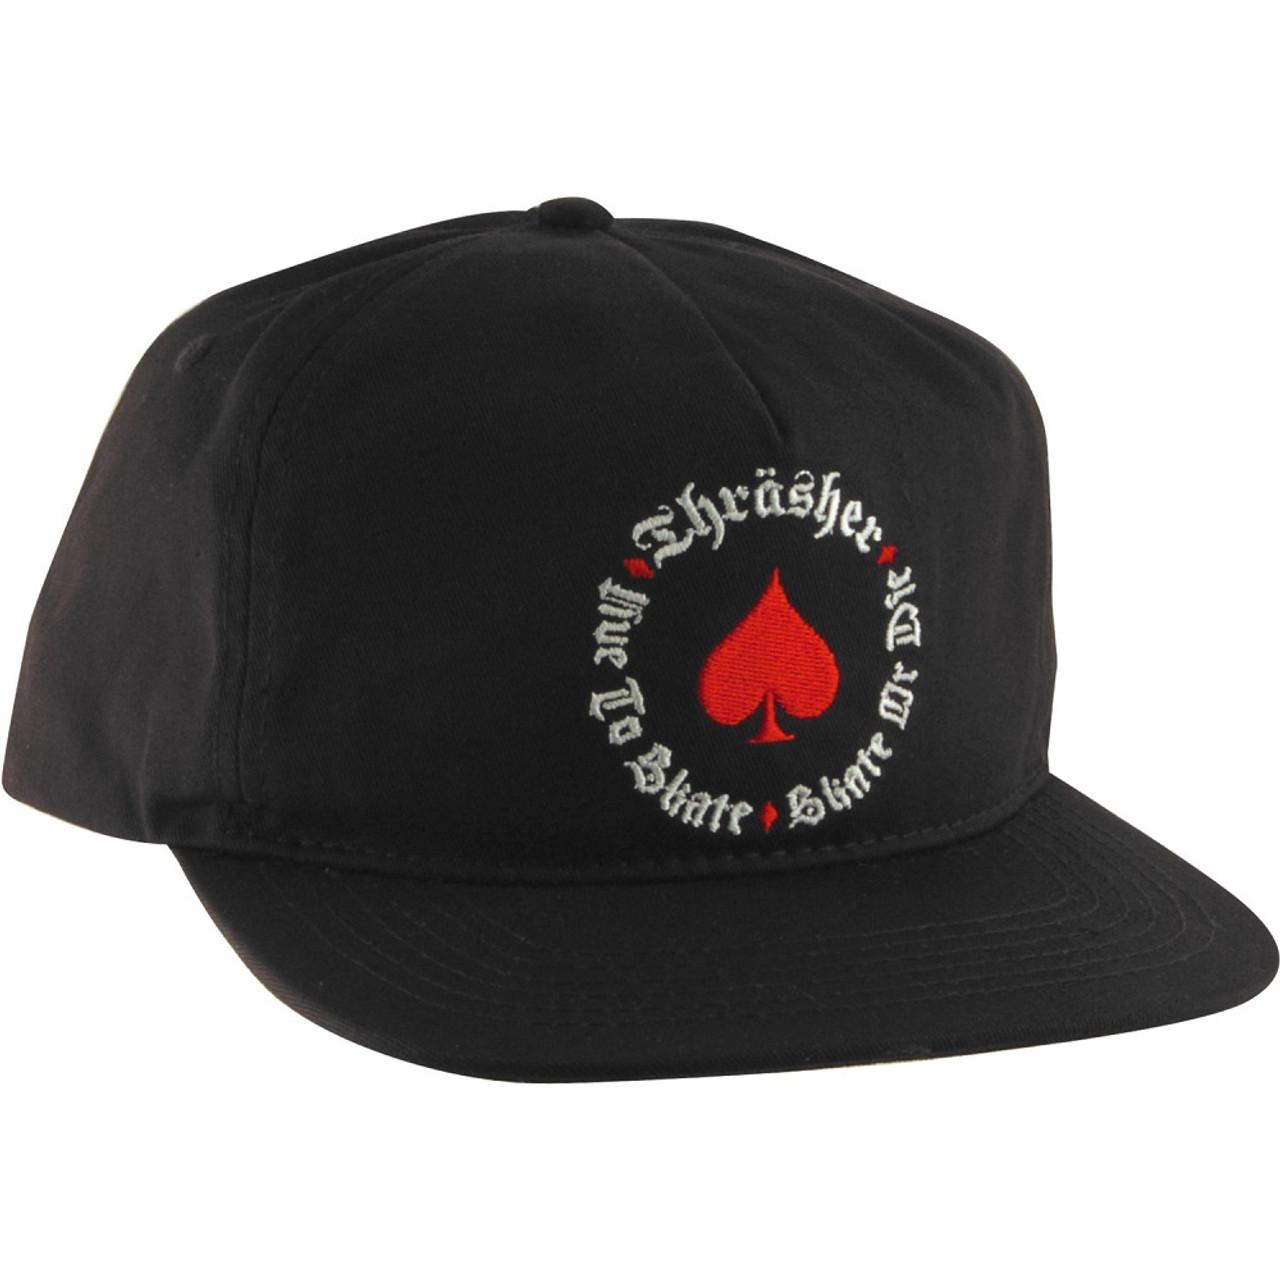 327bfa5747b Thrasher Oath Hat Black Snapback